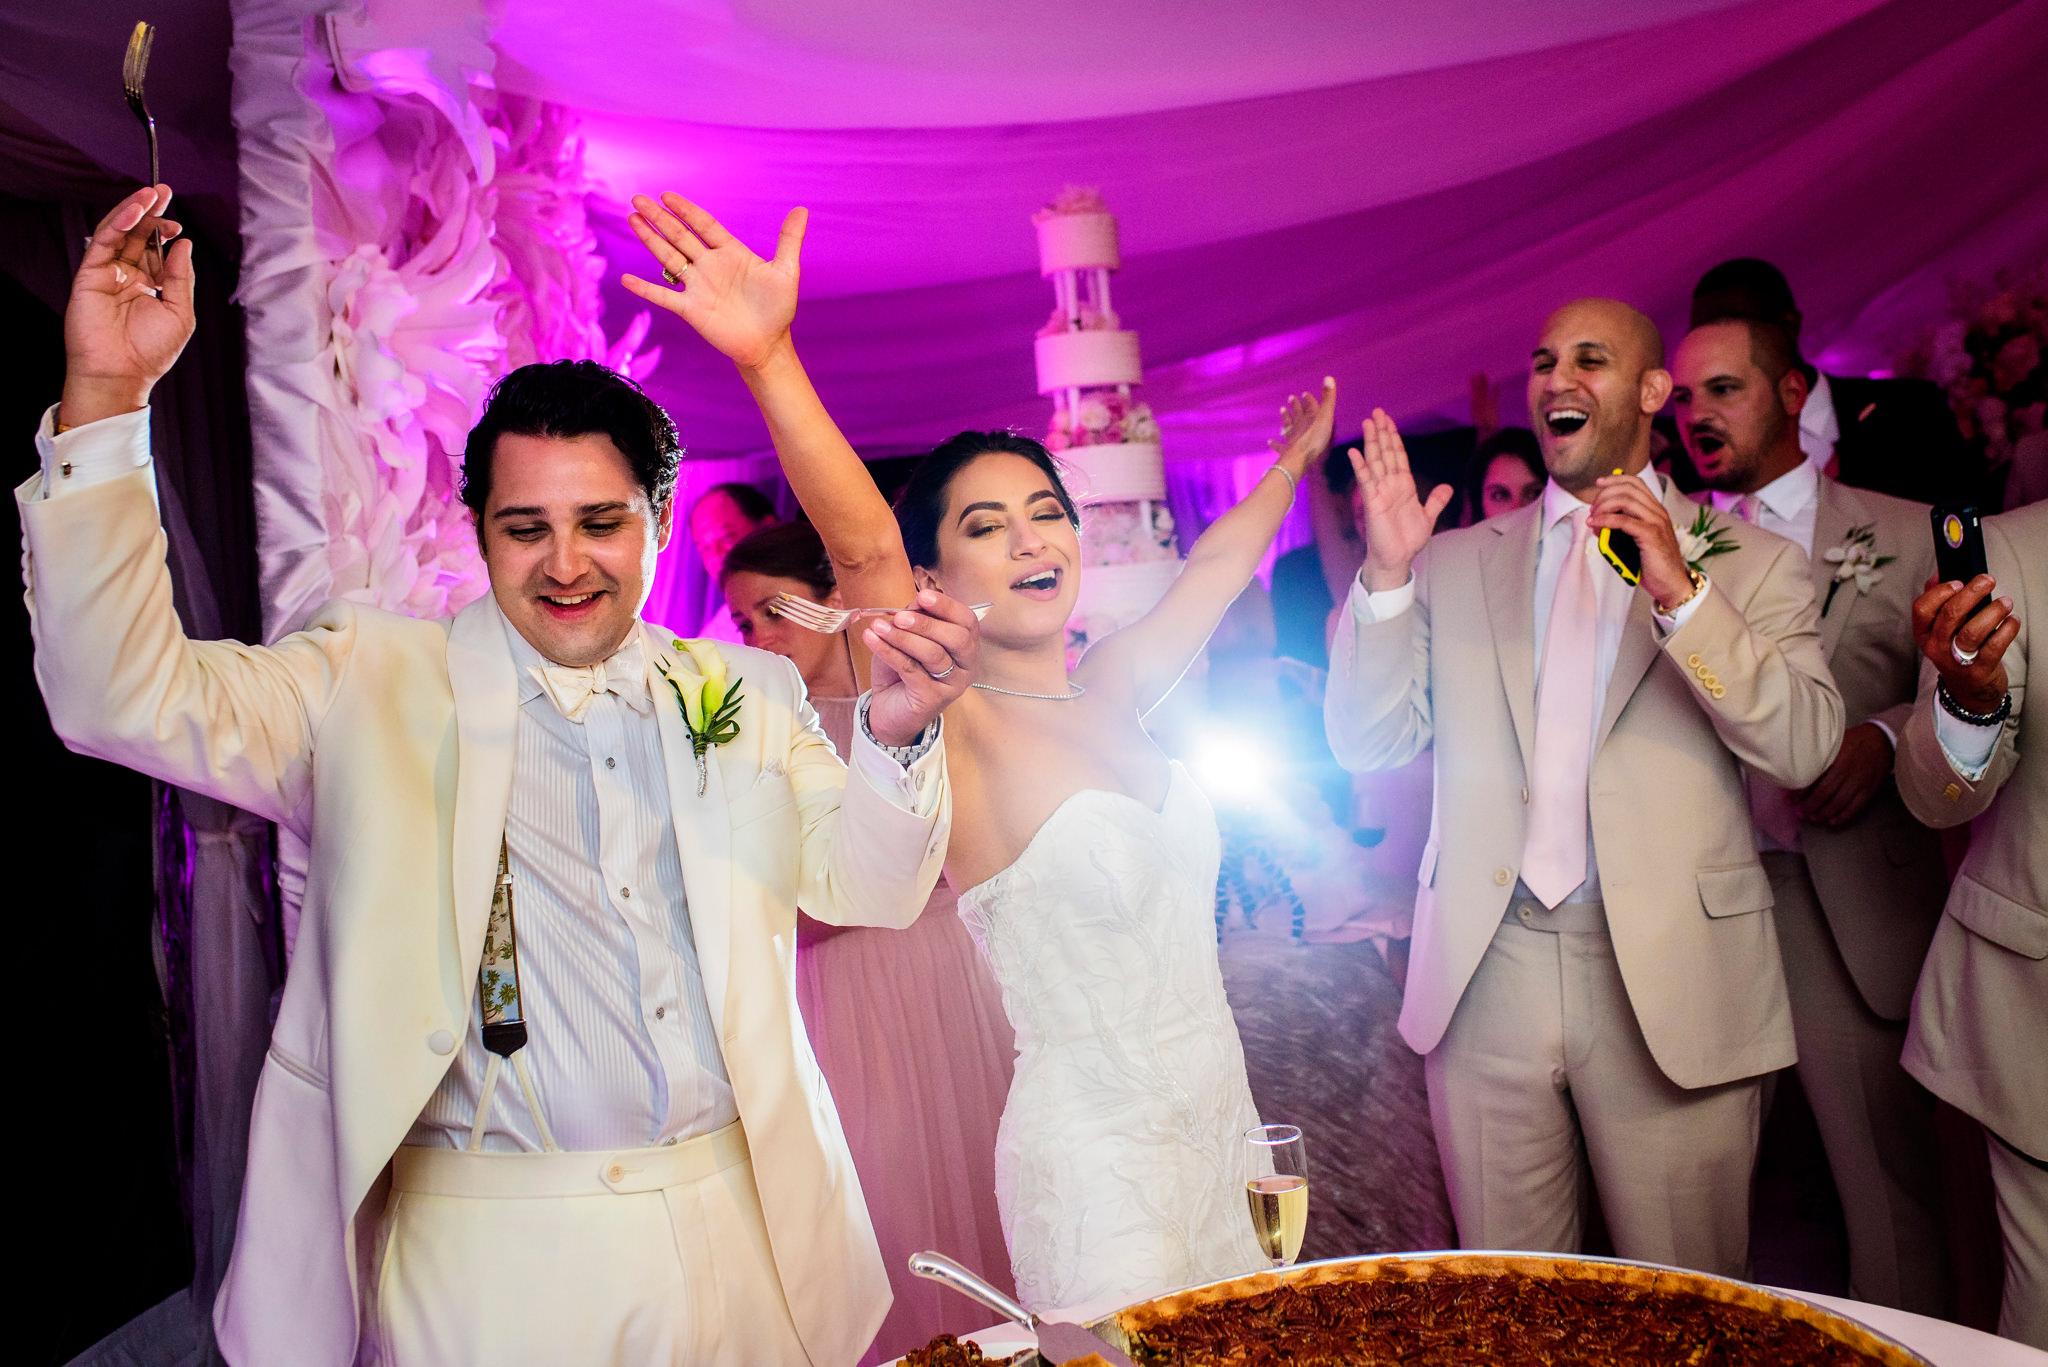 33-ashley-conner-four-seasons-resort-hualalai-wedding